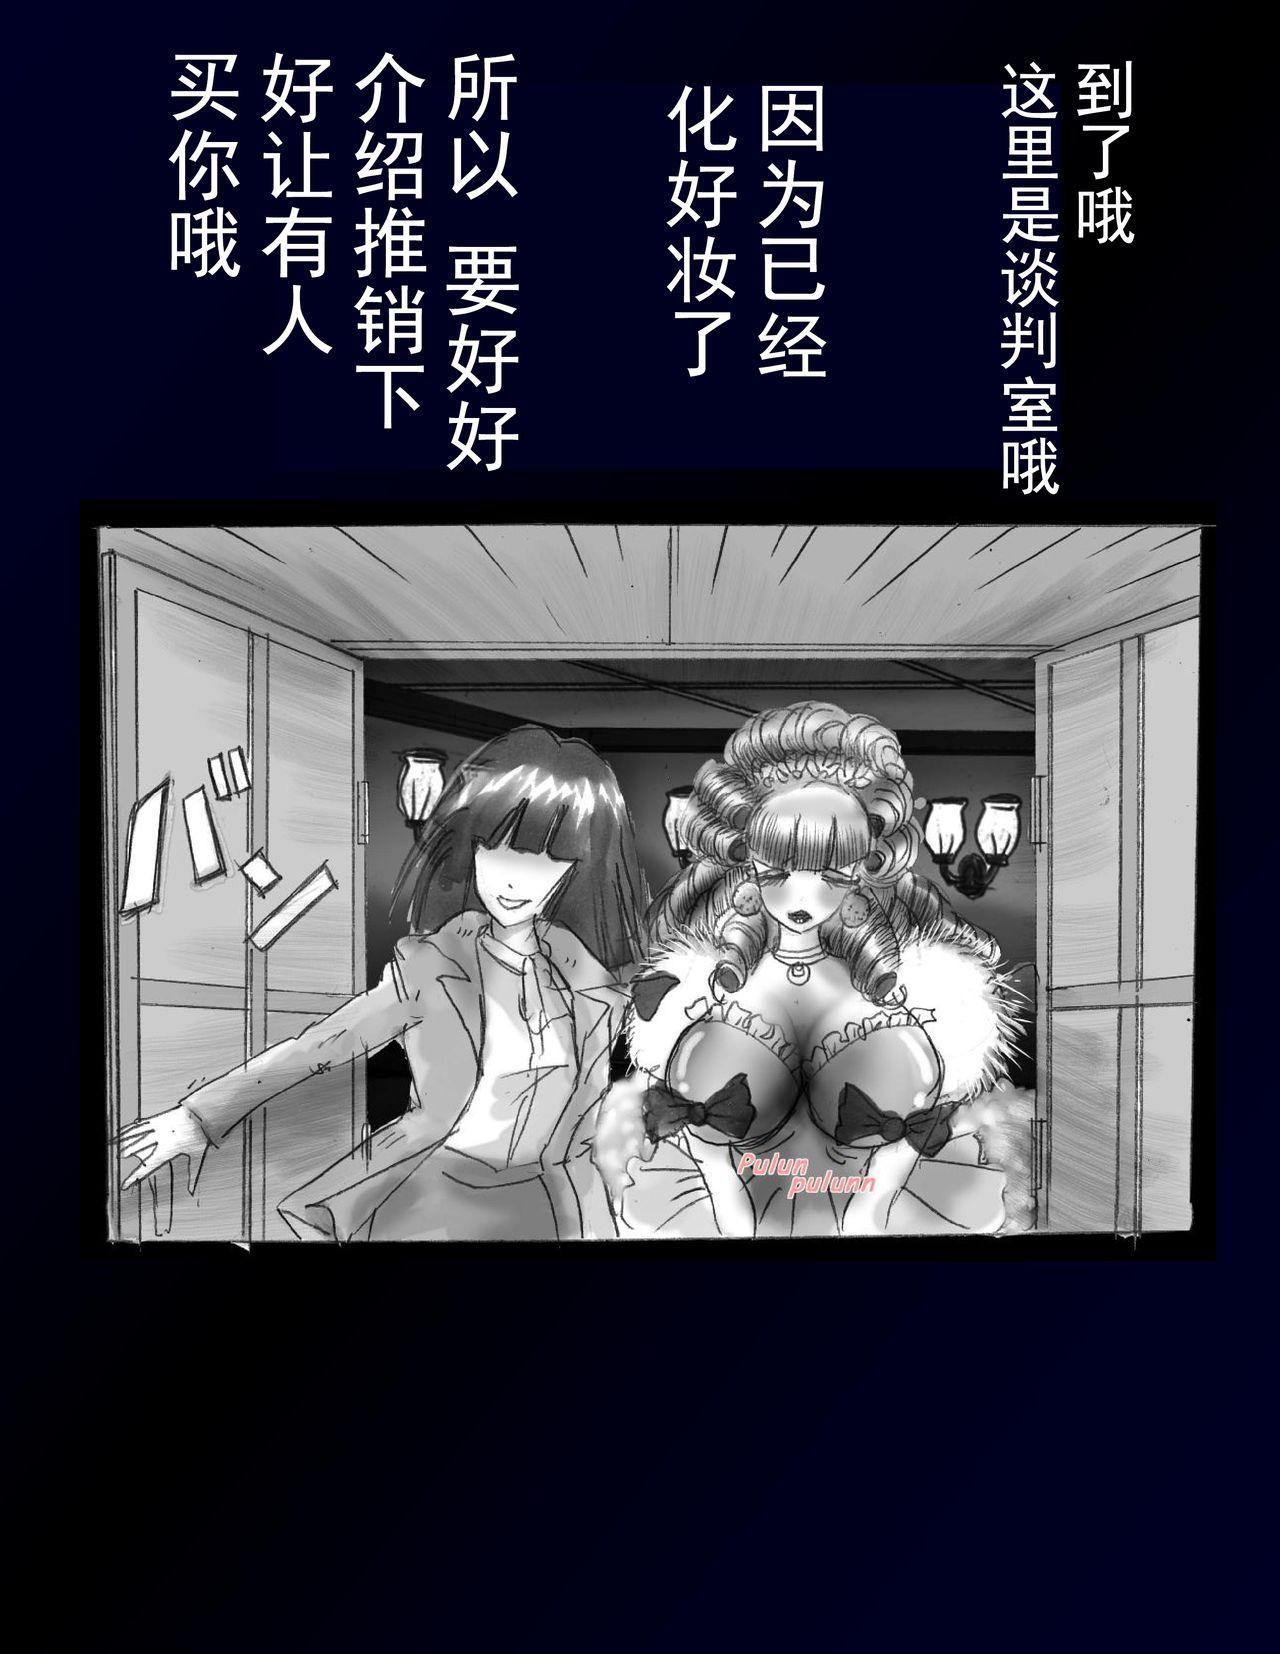 Kyousei Nyotaika Dress 65